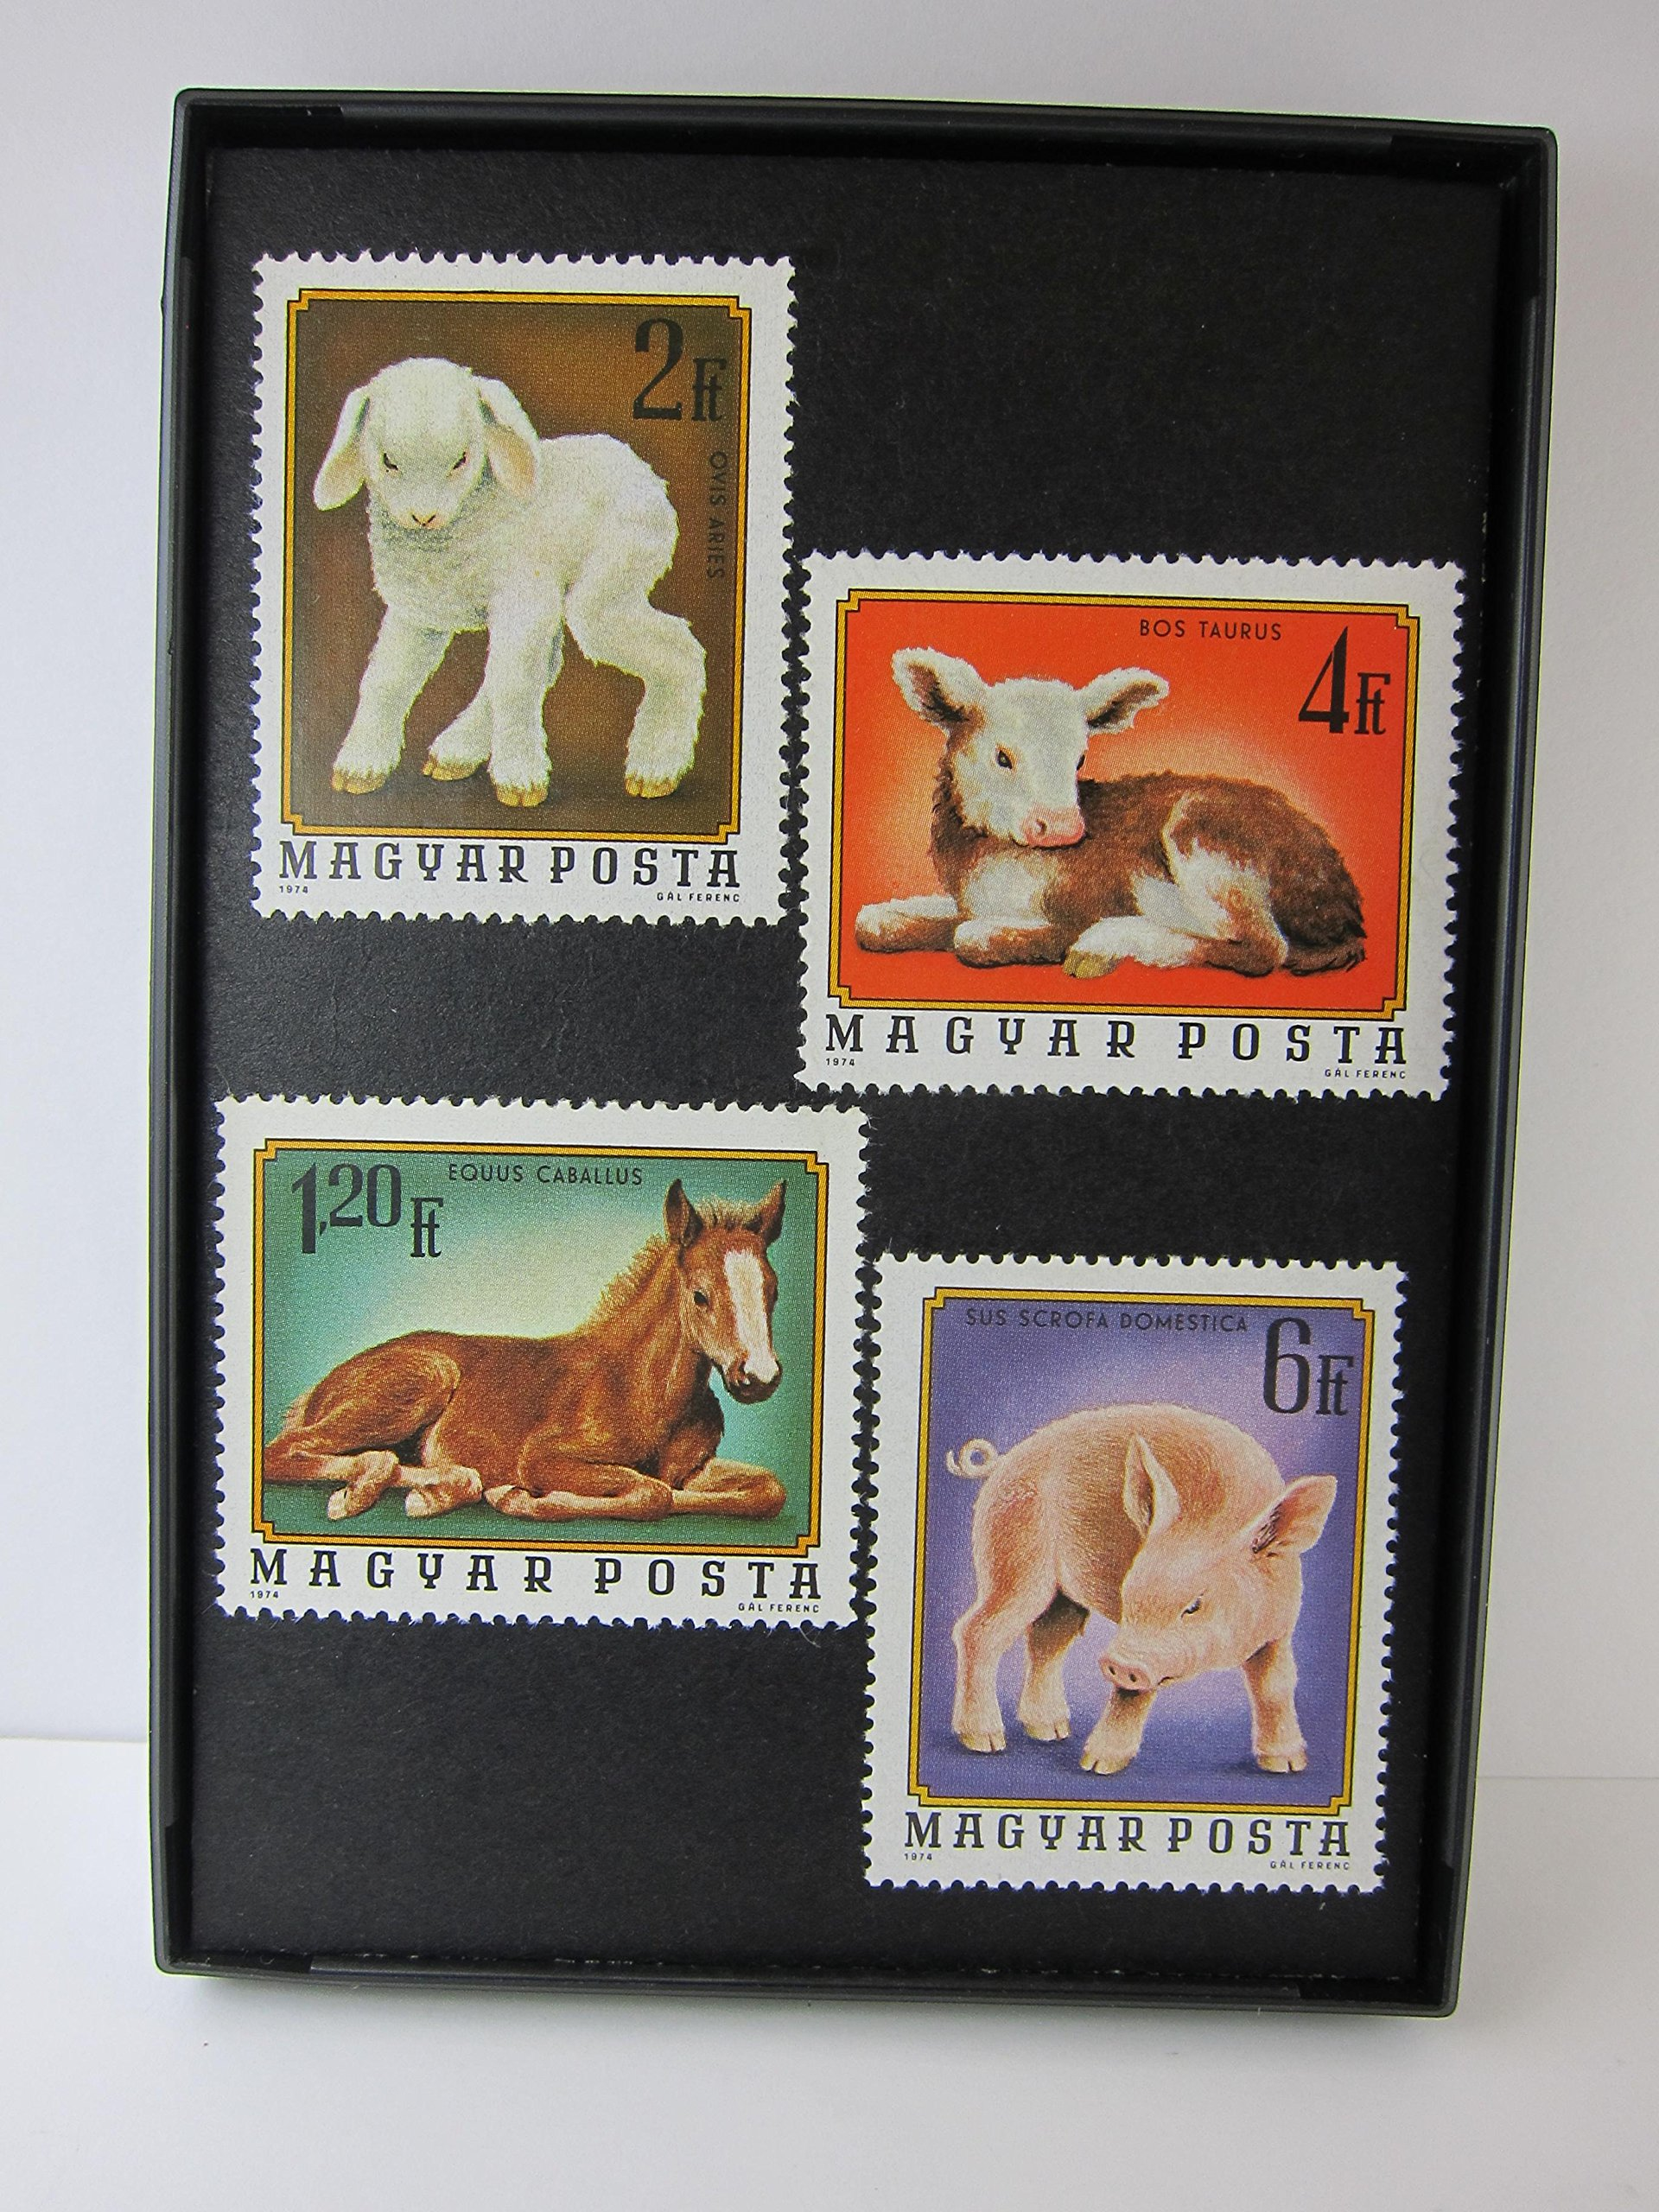 Baby Farm Animal Framed Postage Stamp Art - 3.5 x 5'' Item#F28